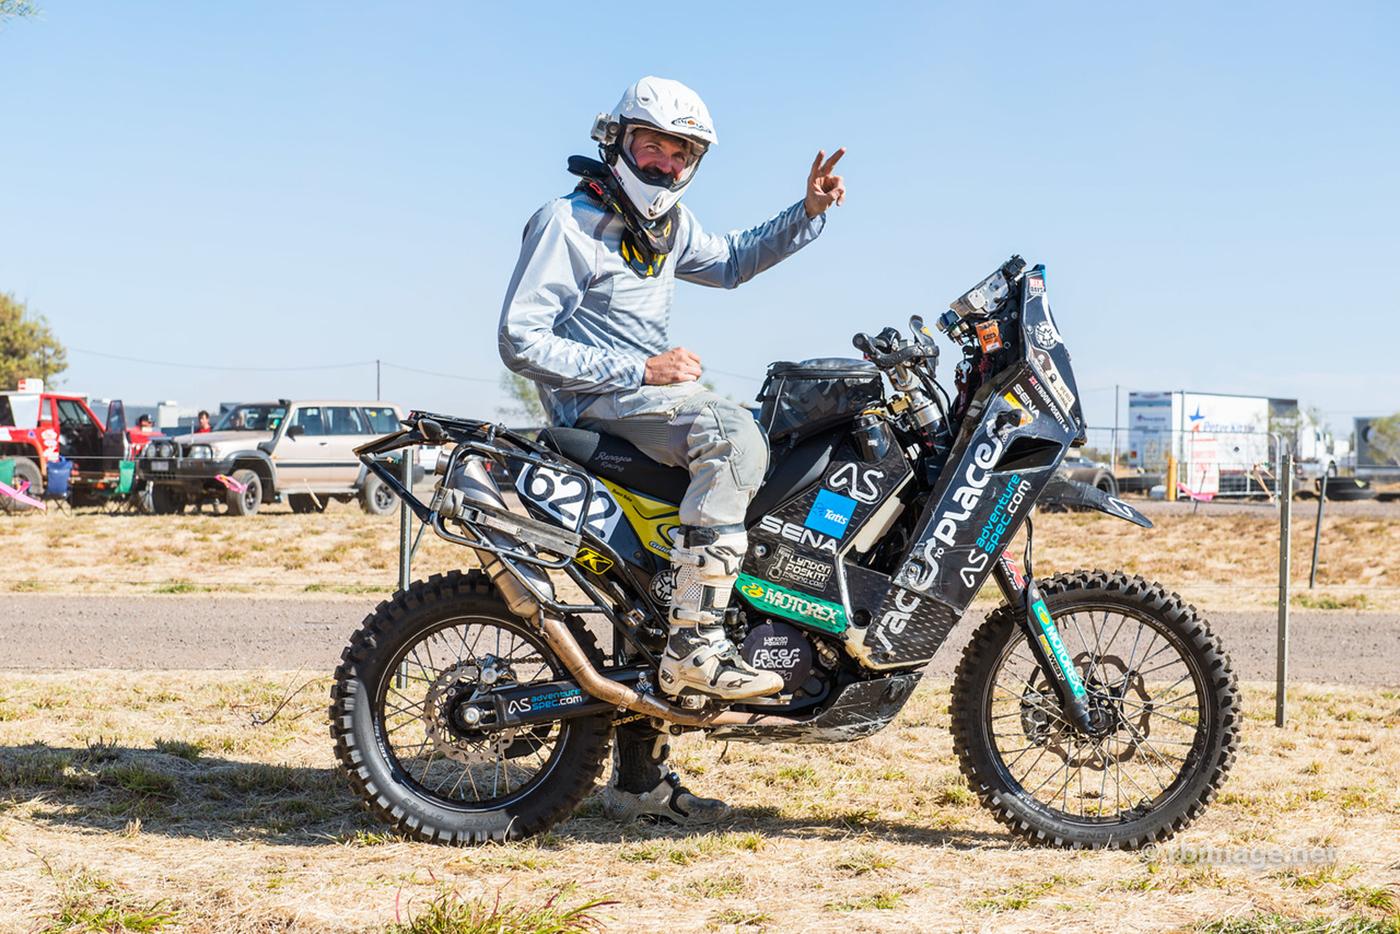 Ktm  Rally Bike For Sale